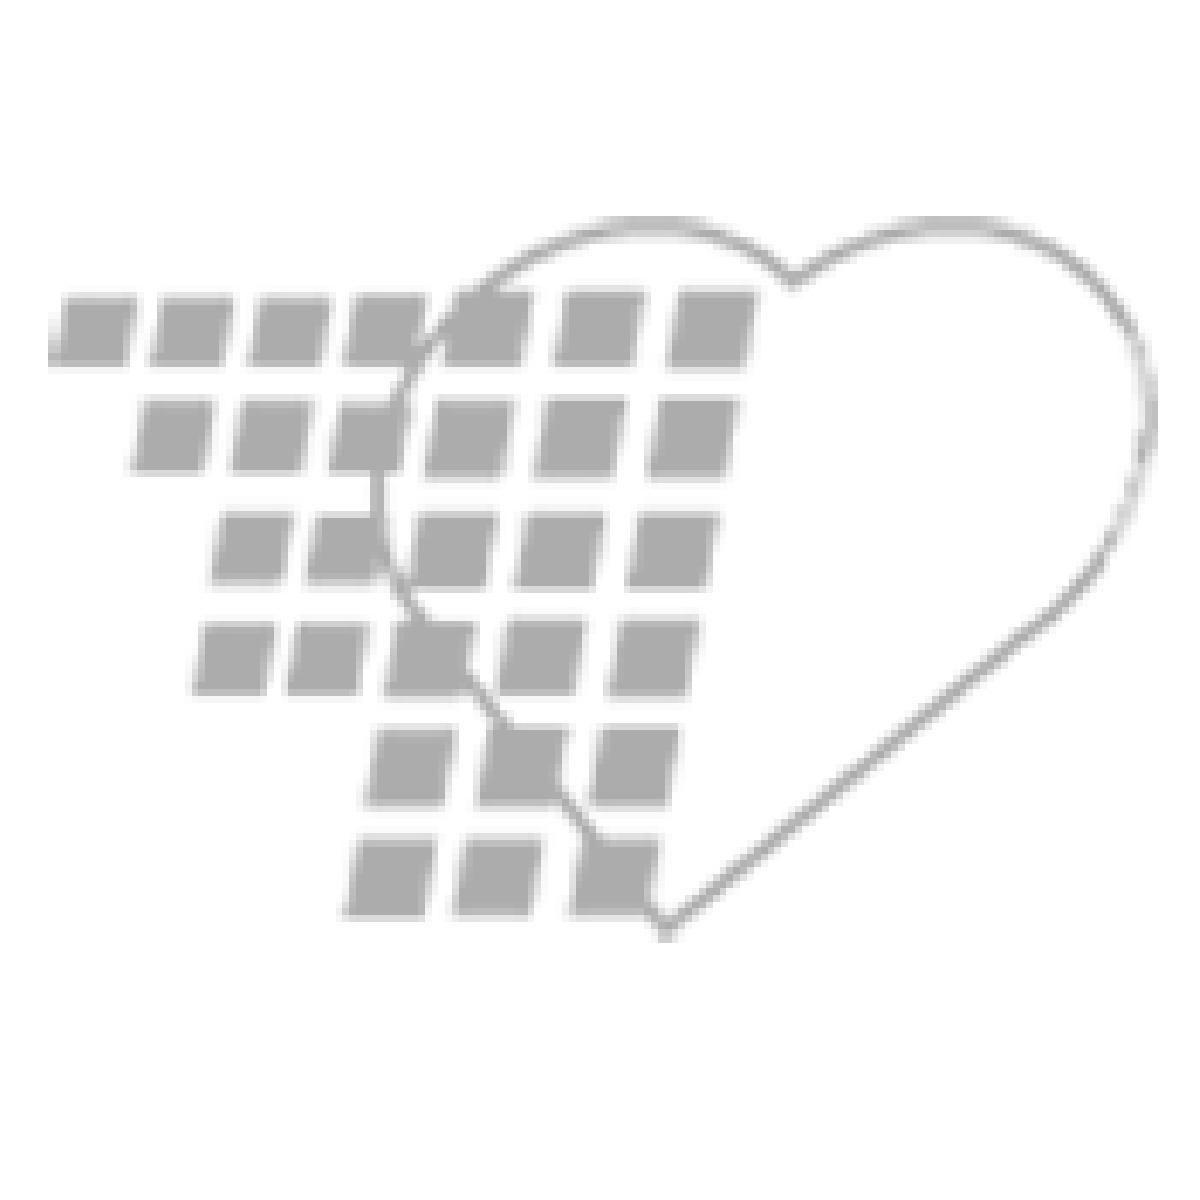 02-87-0100 - Artificial Urine Control 500mL